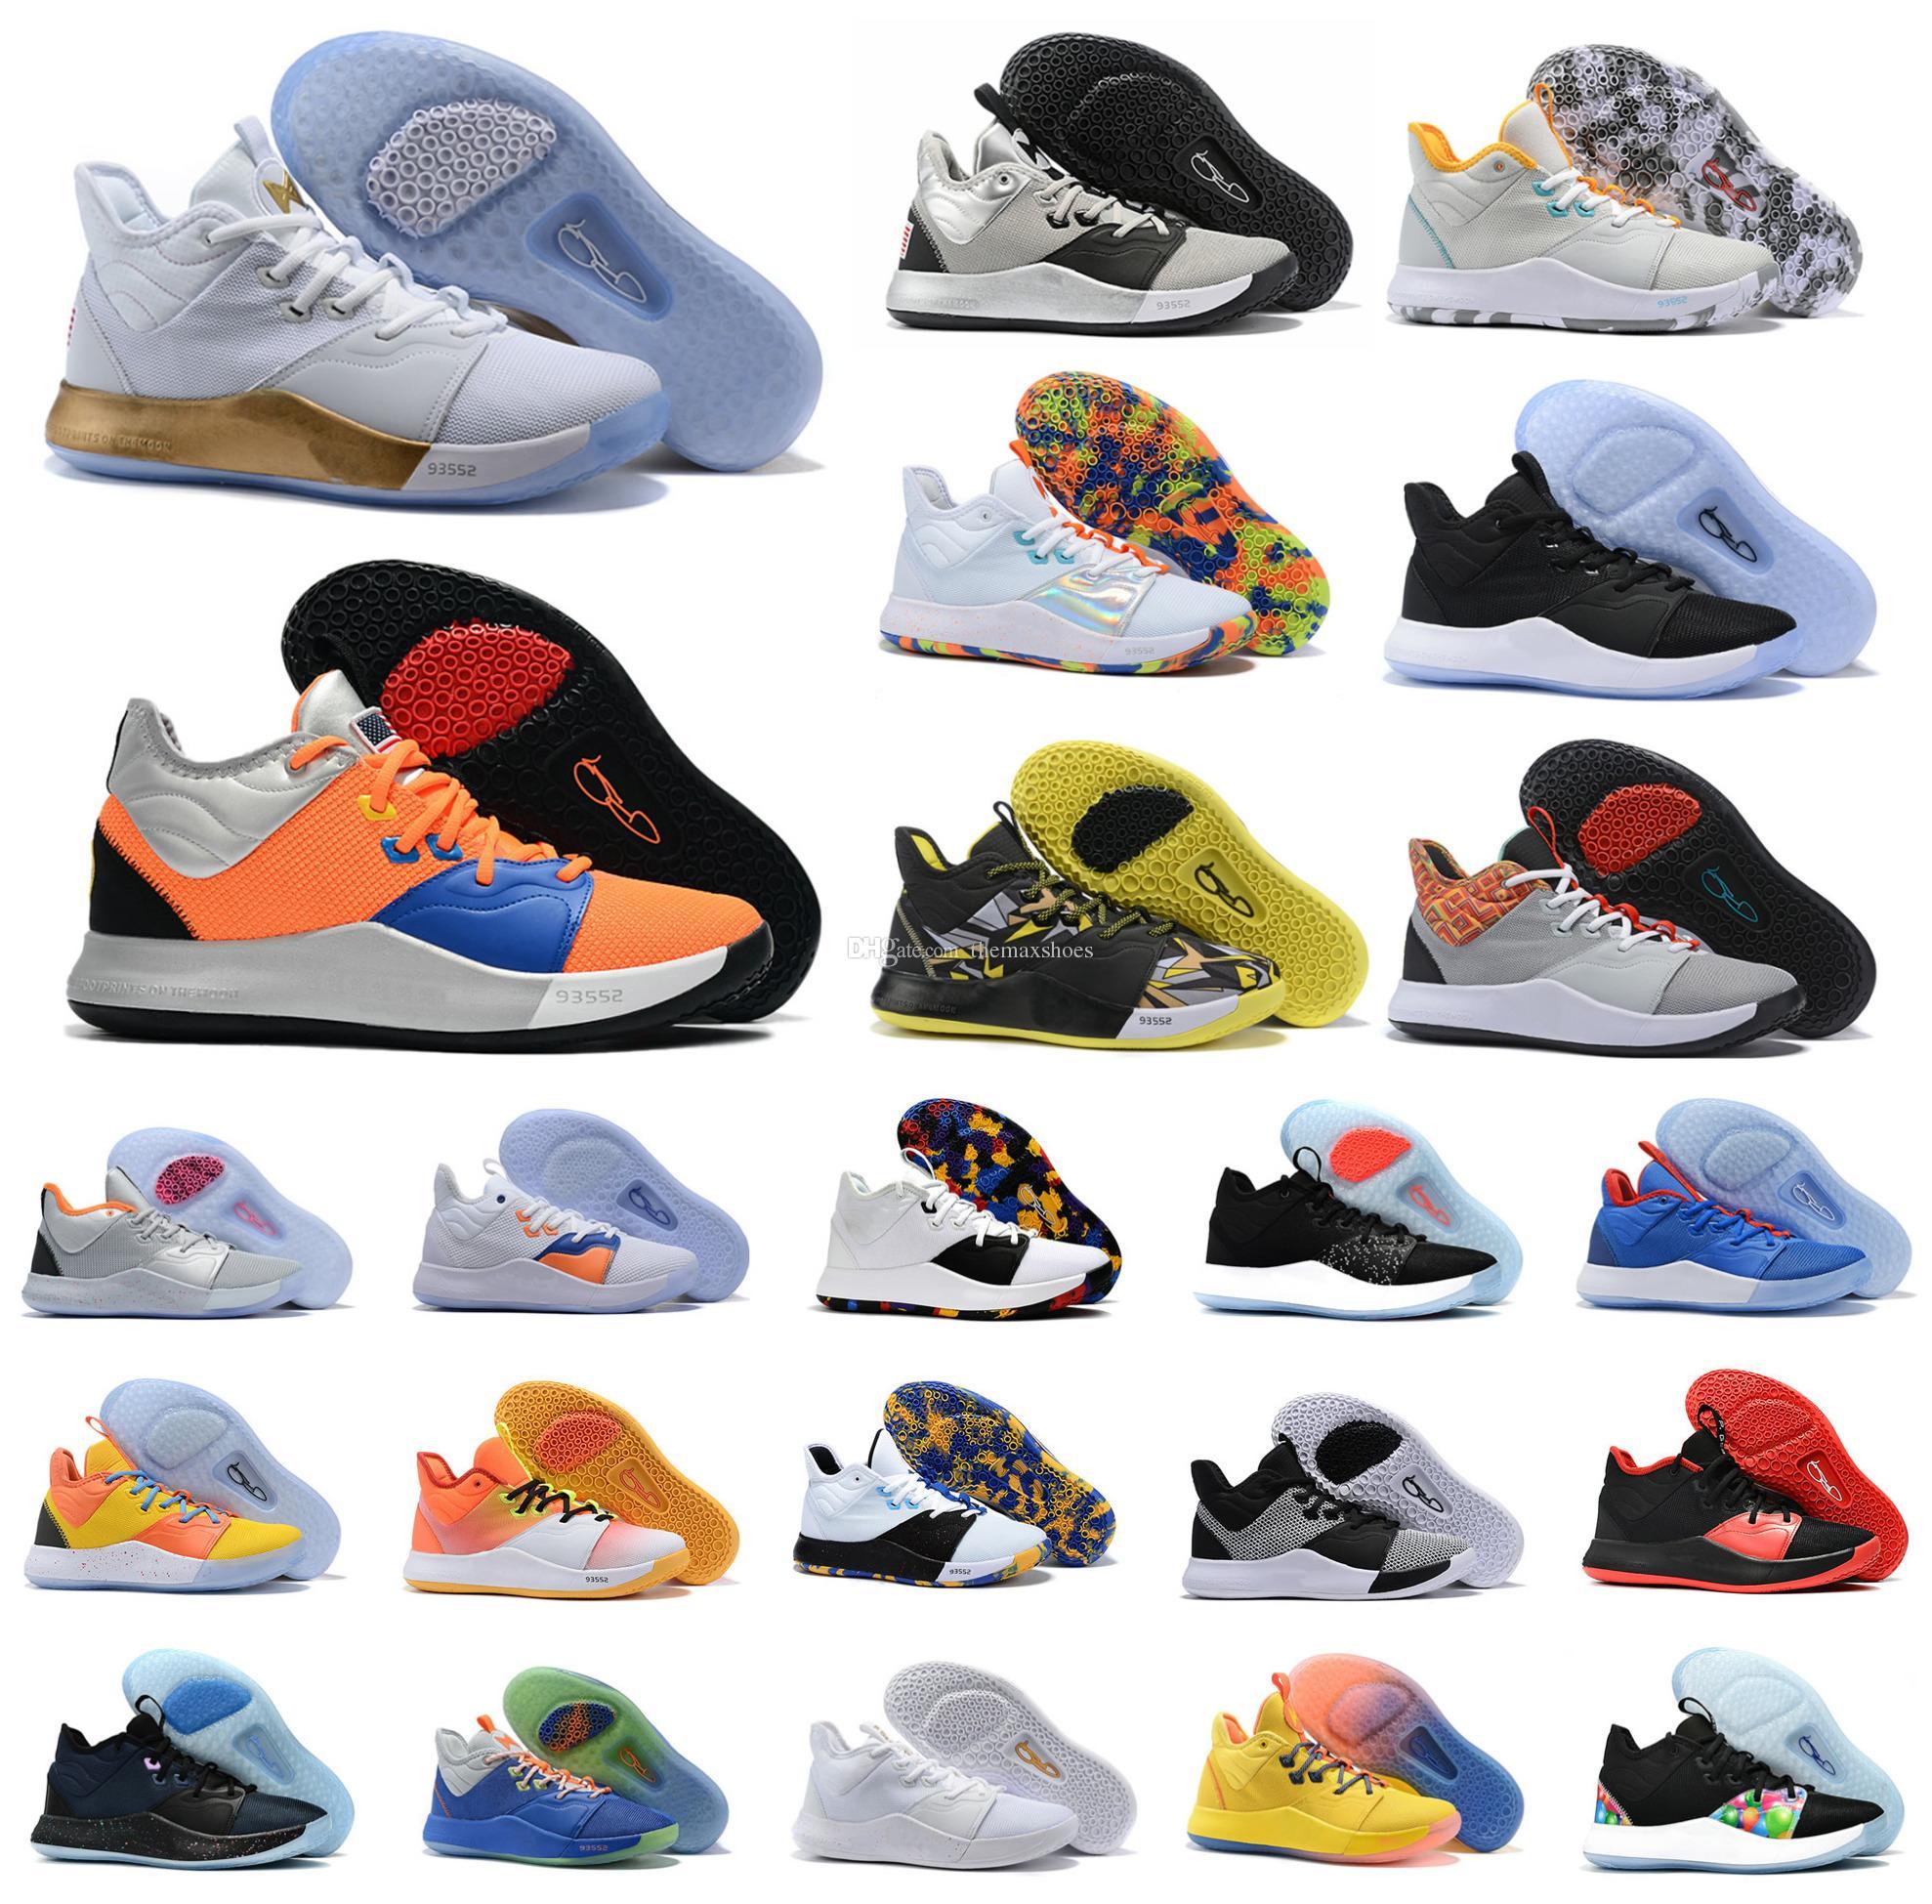 Discount Paul George Shoes | Paul